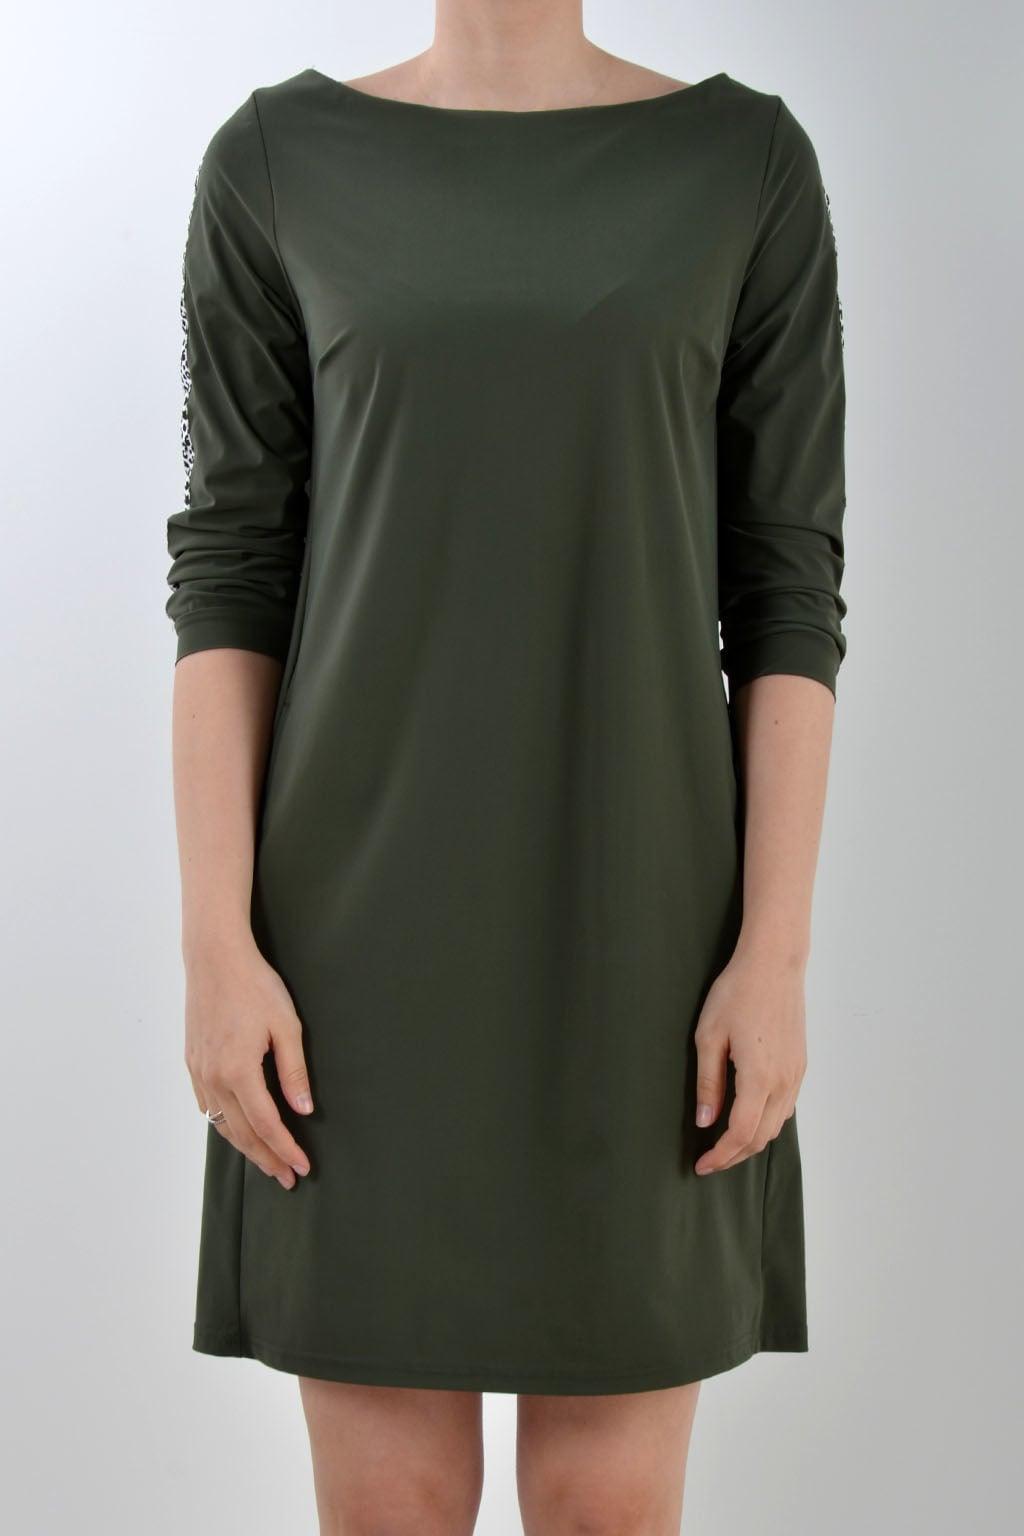 737cb952d61350 Studio anneloes flex tape jurk groen koop je online…